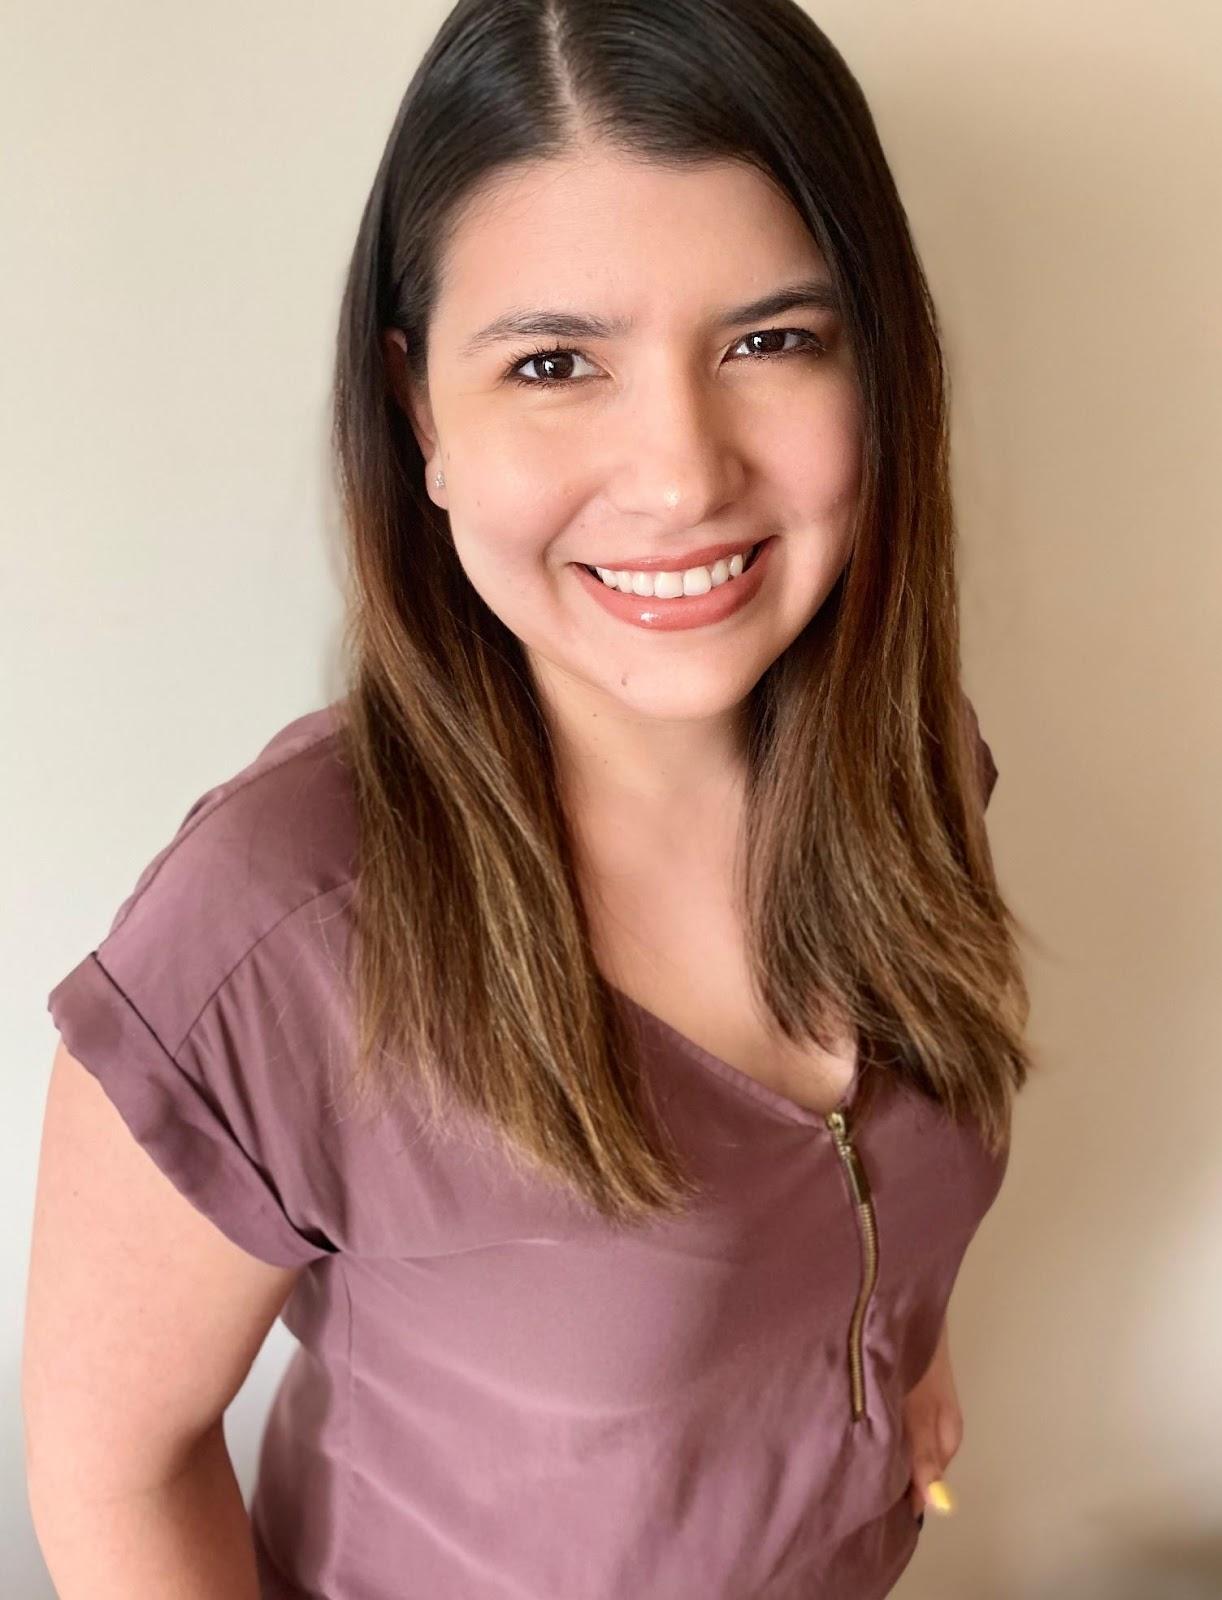 Pamela Villacis